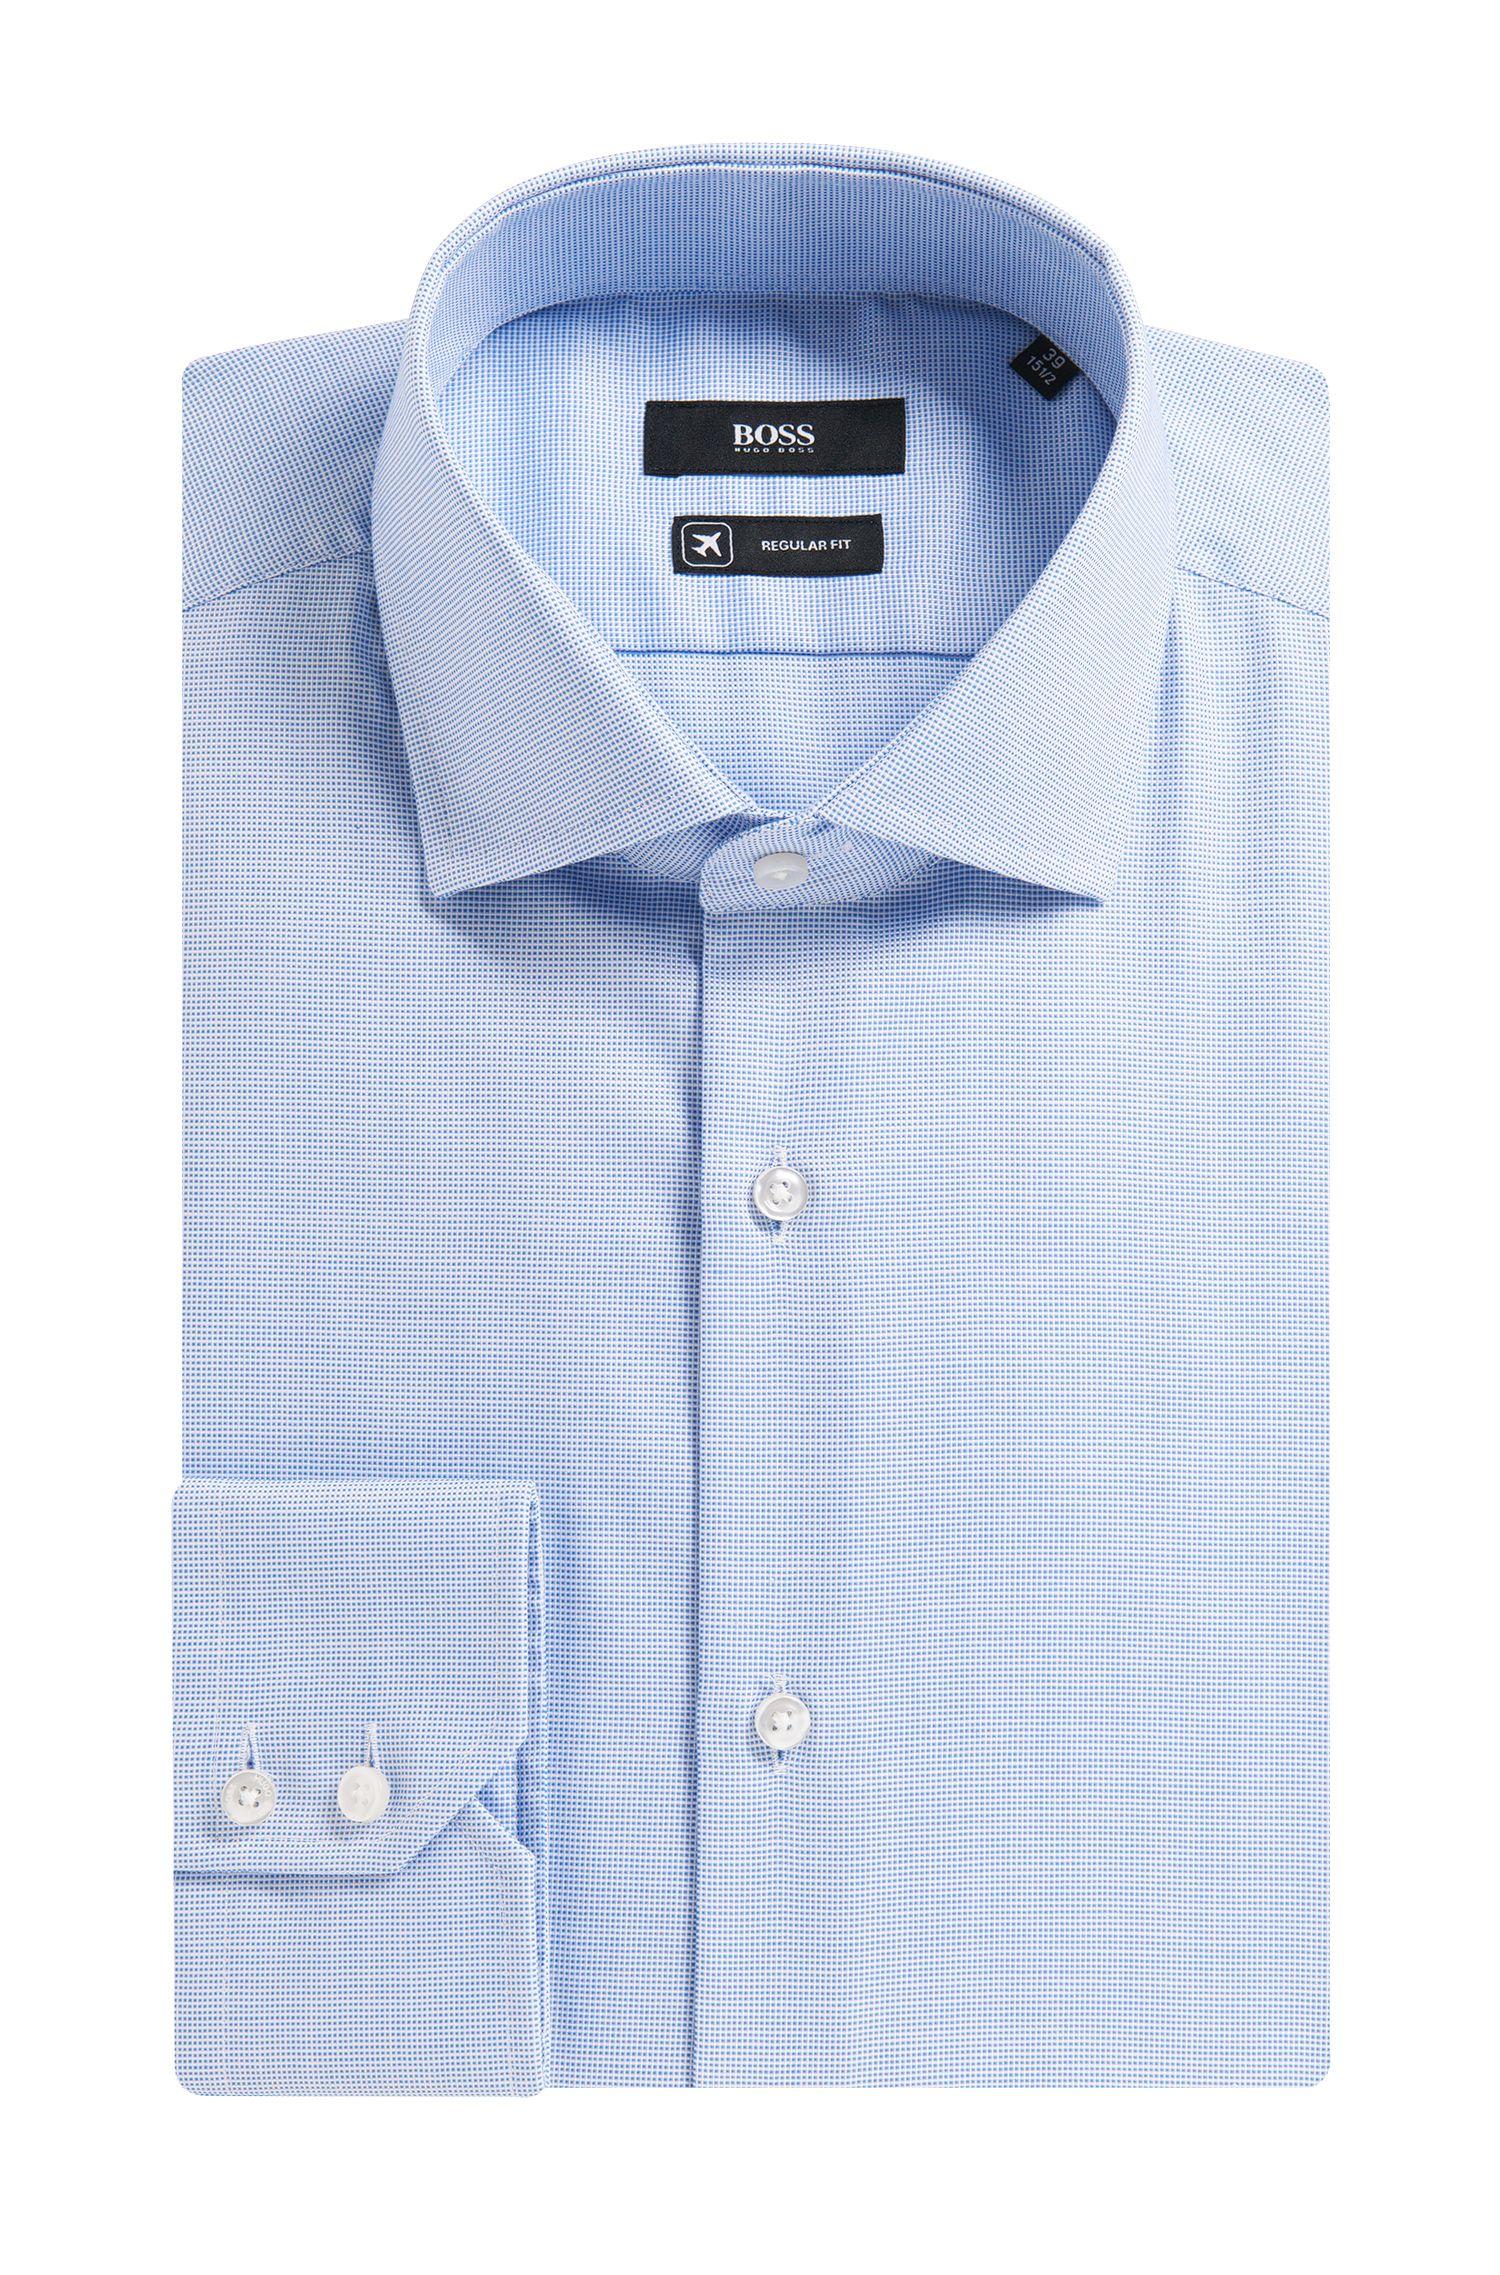 'Gordon' | Regular Fit, Fresh Active Traveler Dress Shirt